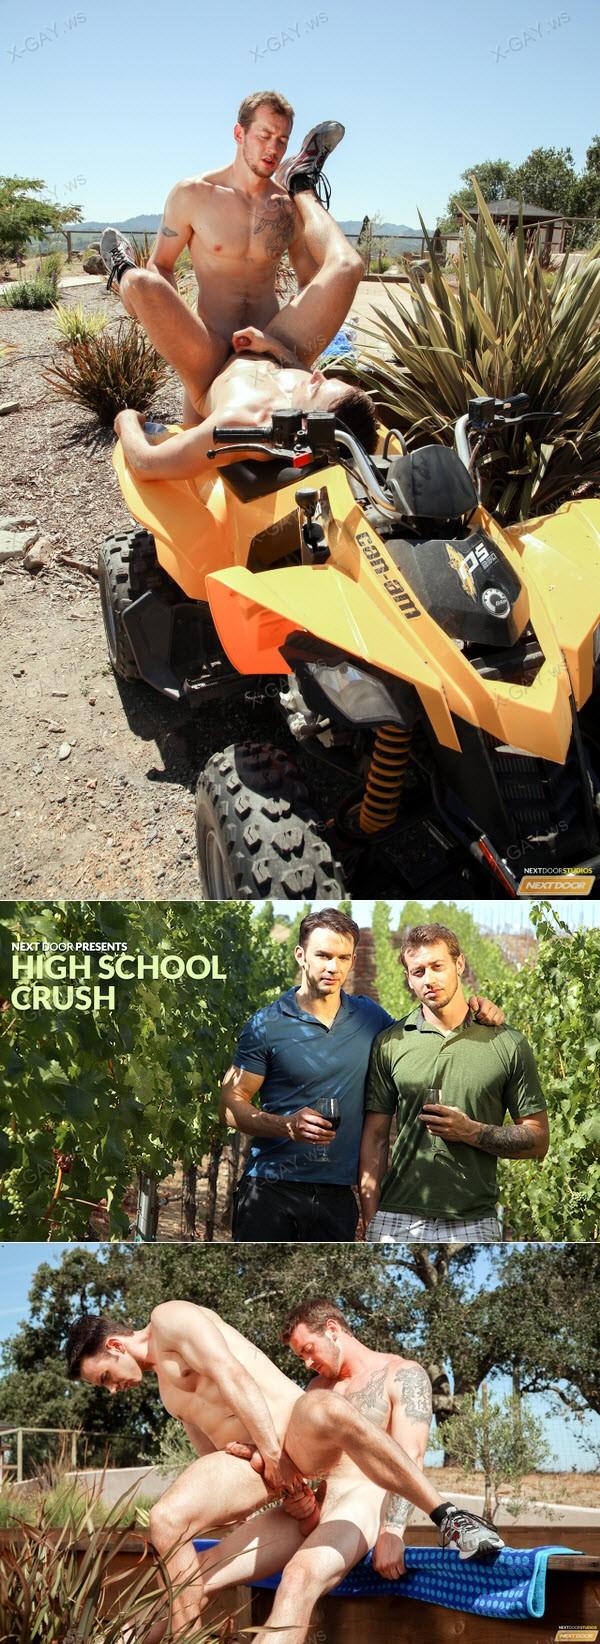 NextDoorBuddies: High School Crush (Mark Long, Addison Graham)